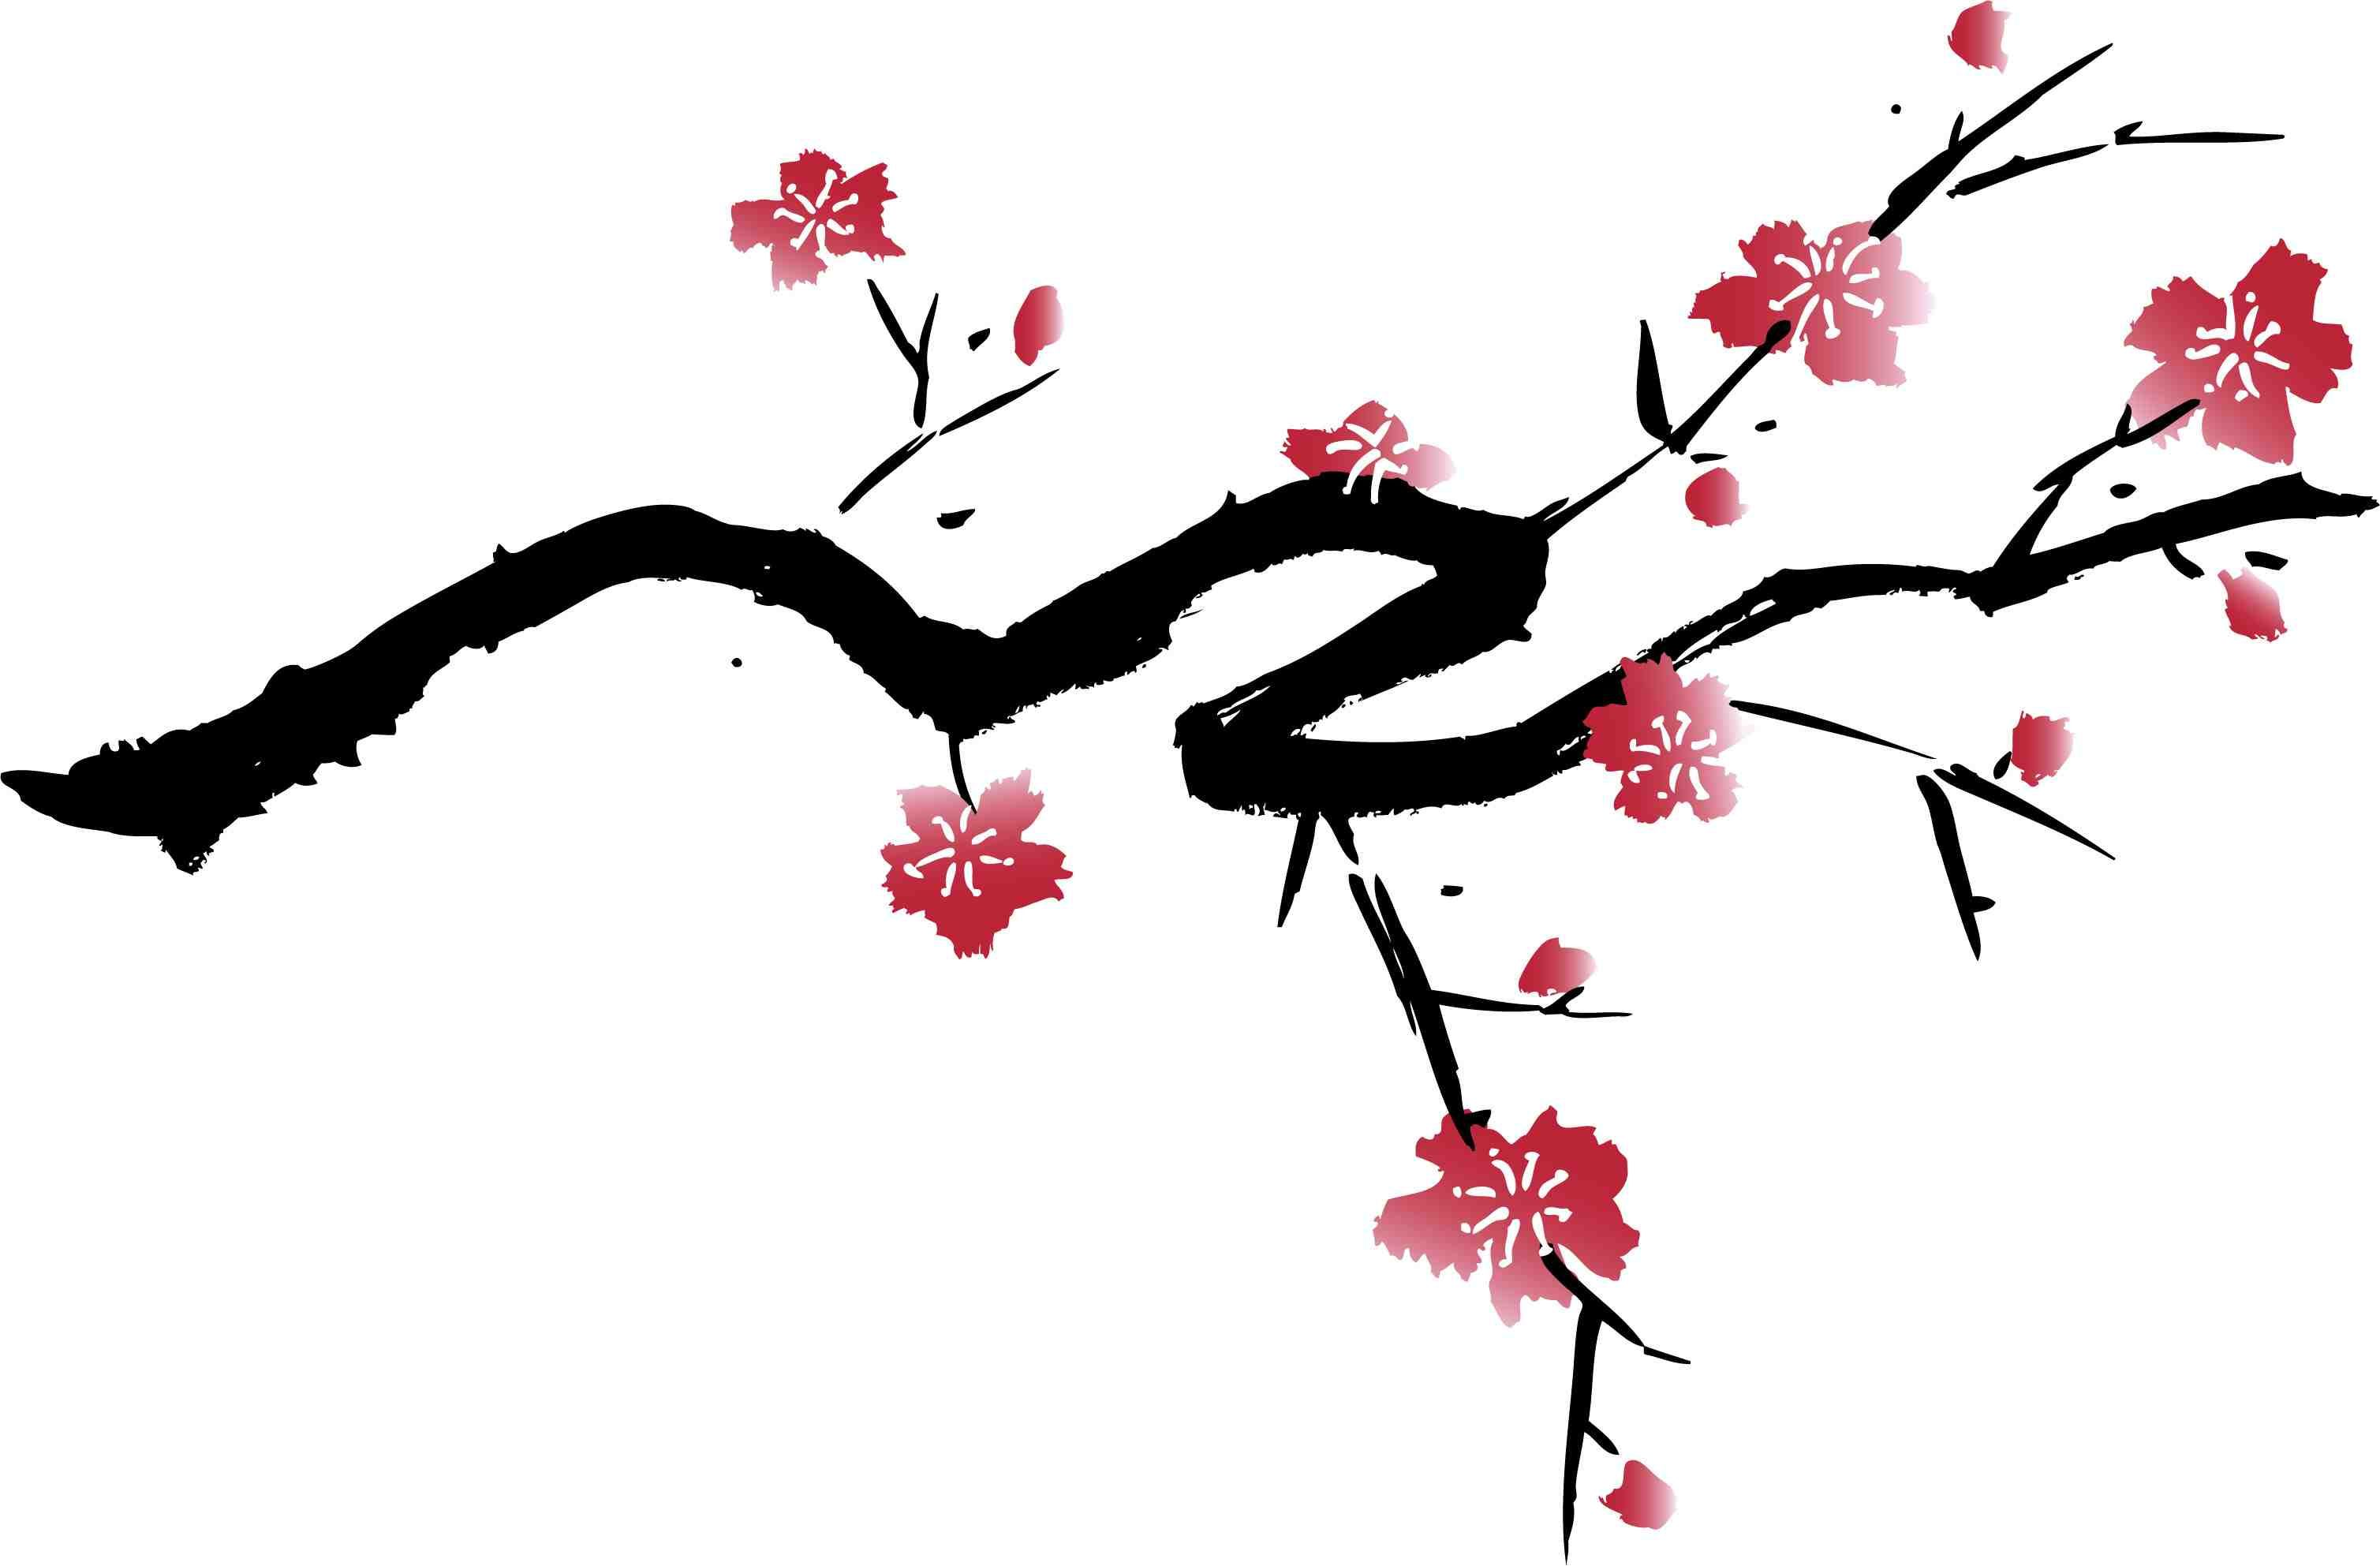 Thumbnailtcbp2 Jpg 3 017 1 985 Pixels For Invites Japanese Cherry Blossom Japanese Cherry Tree Cherry Blossom Images